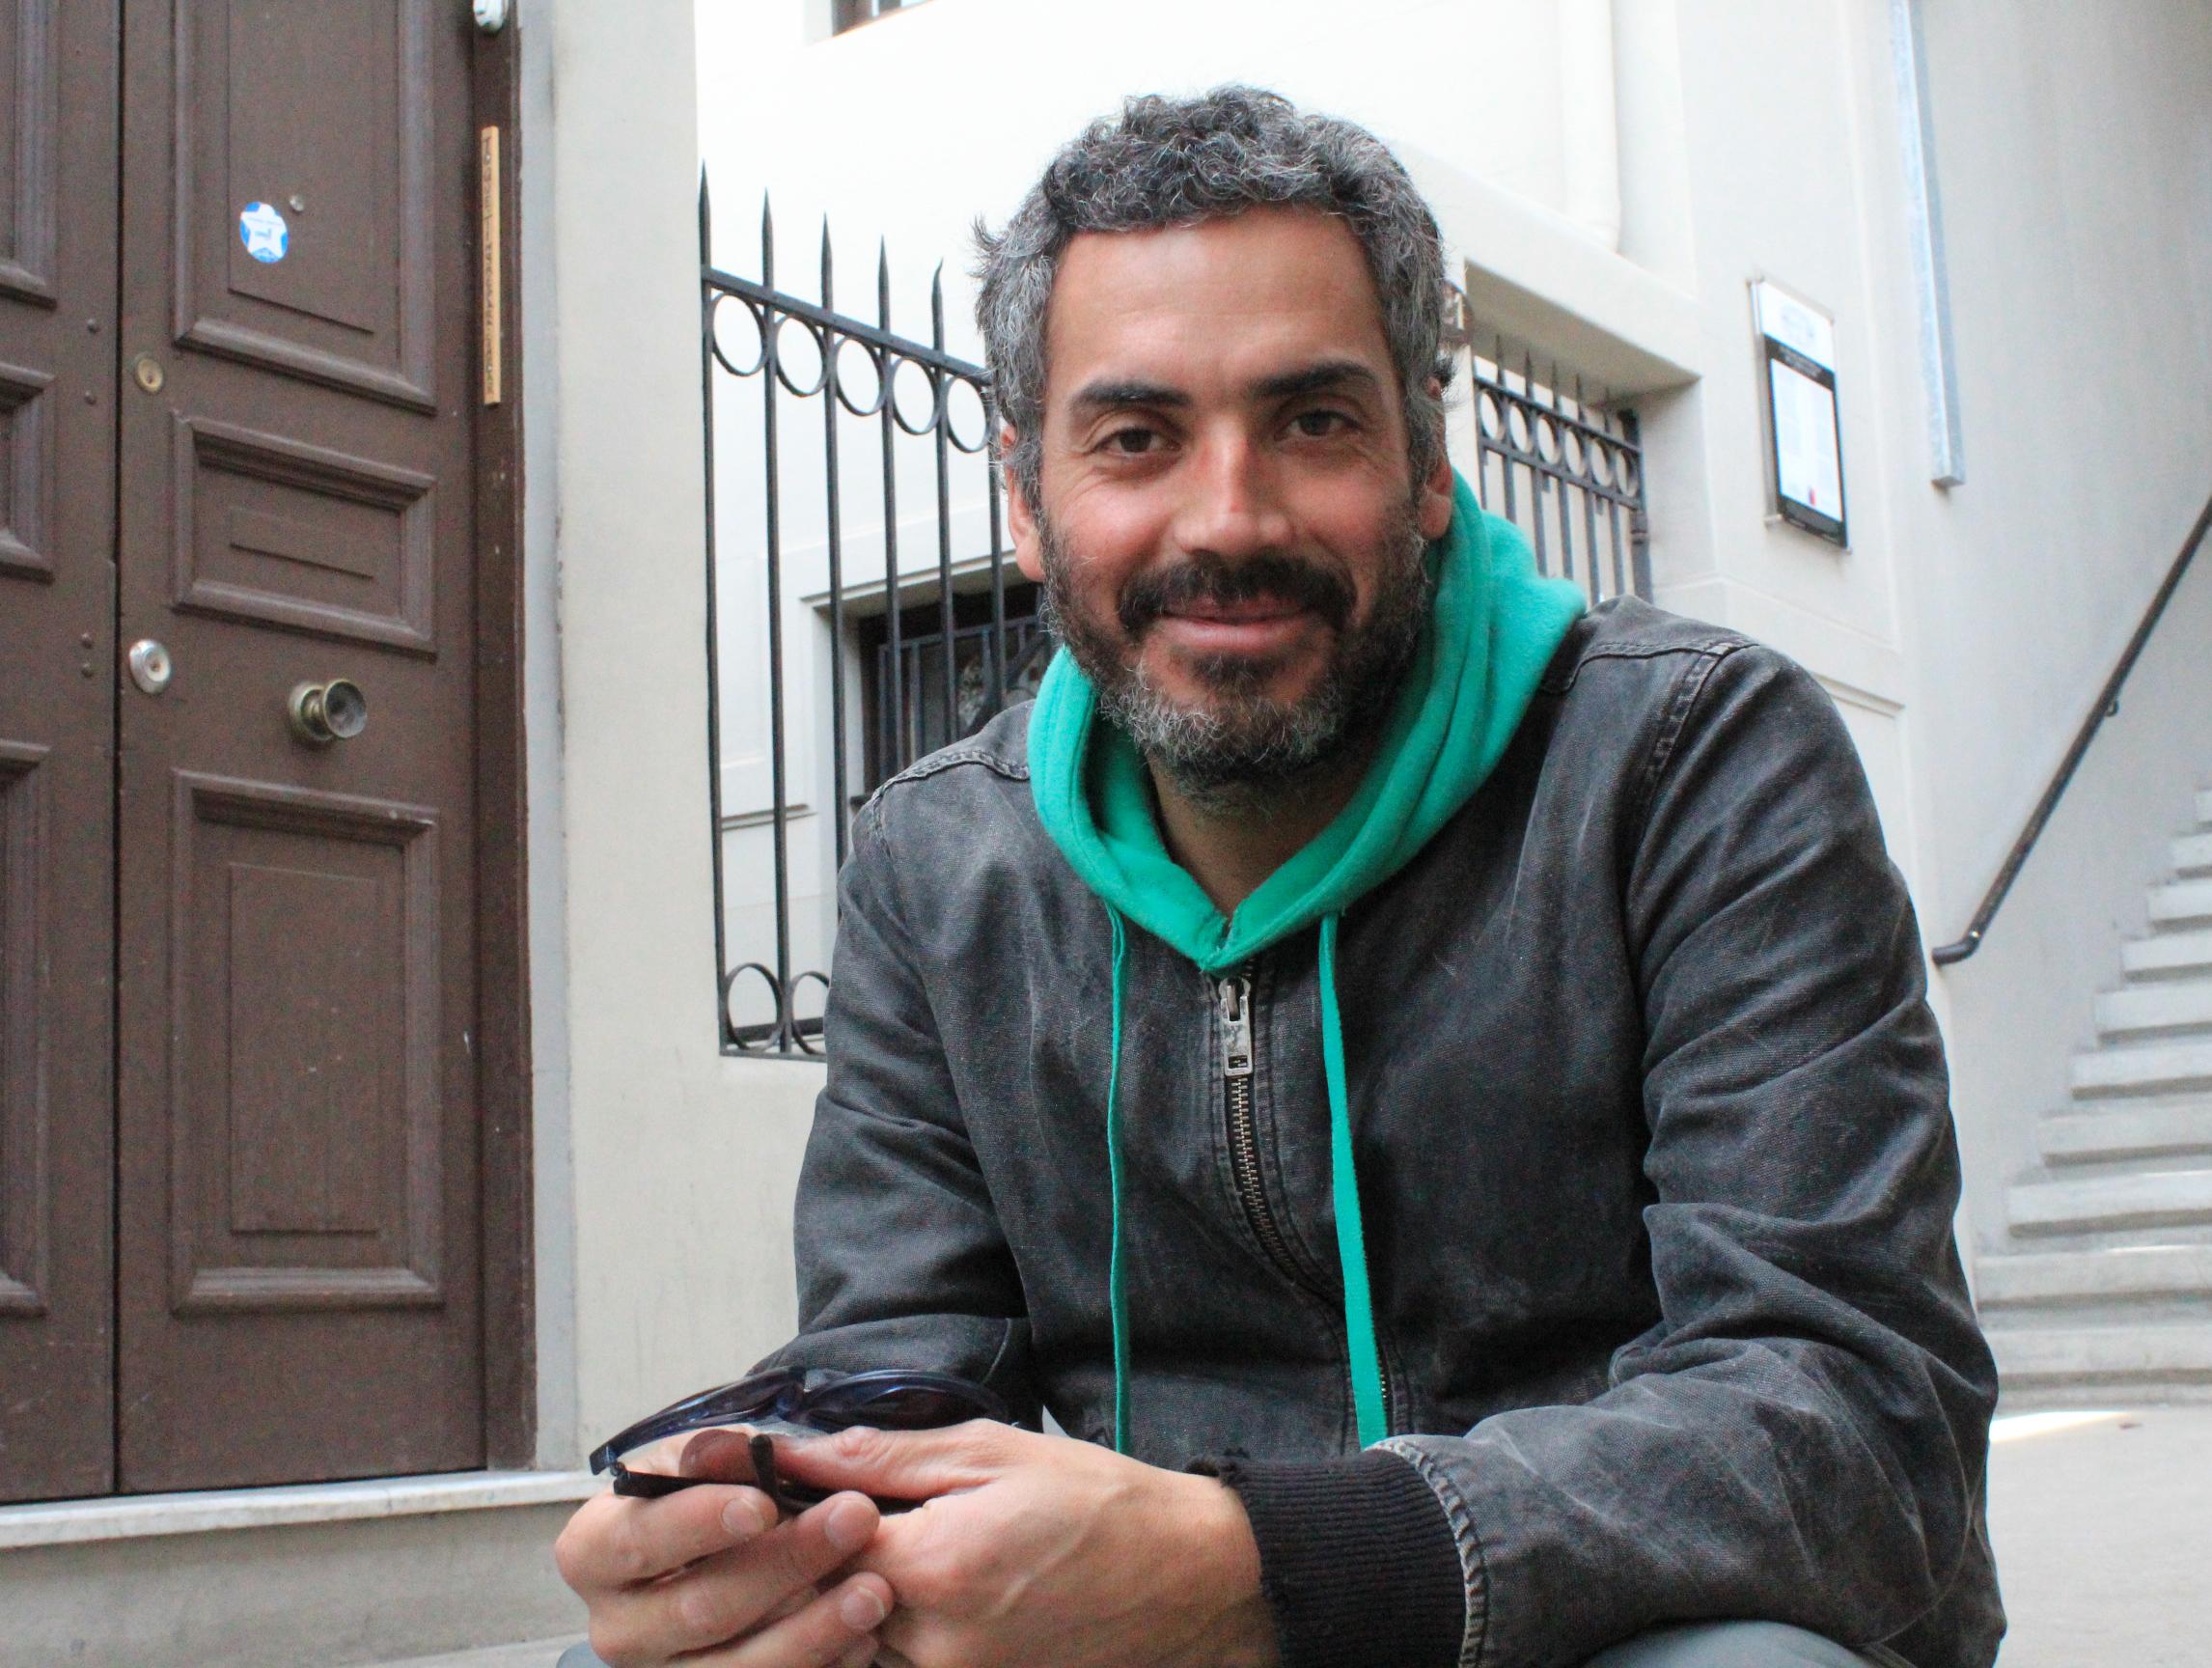 Marco Montero Lara